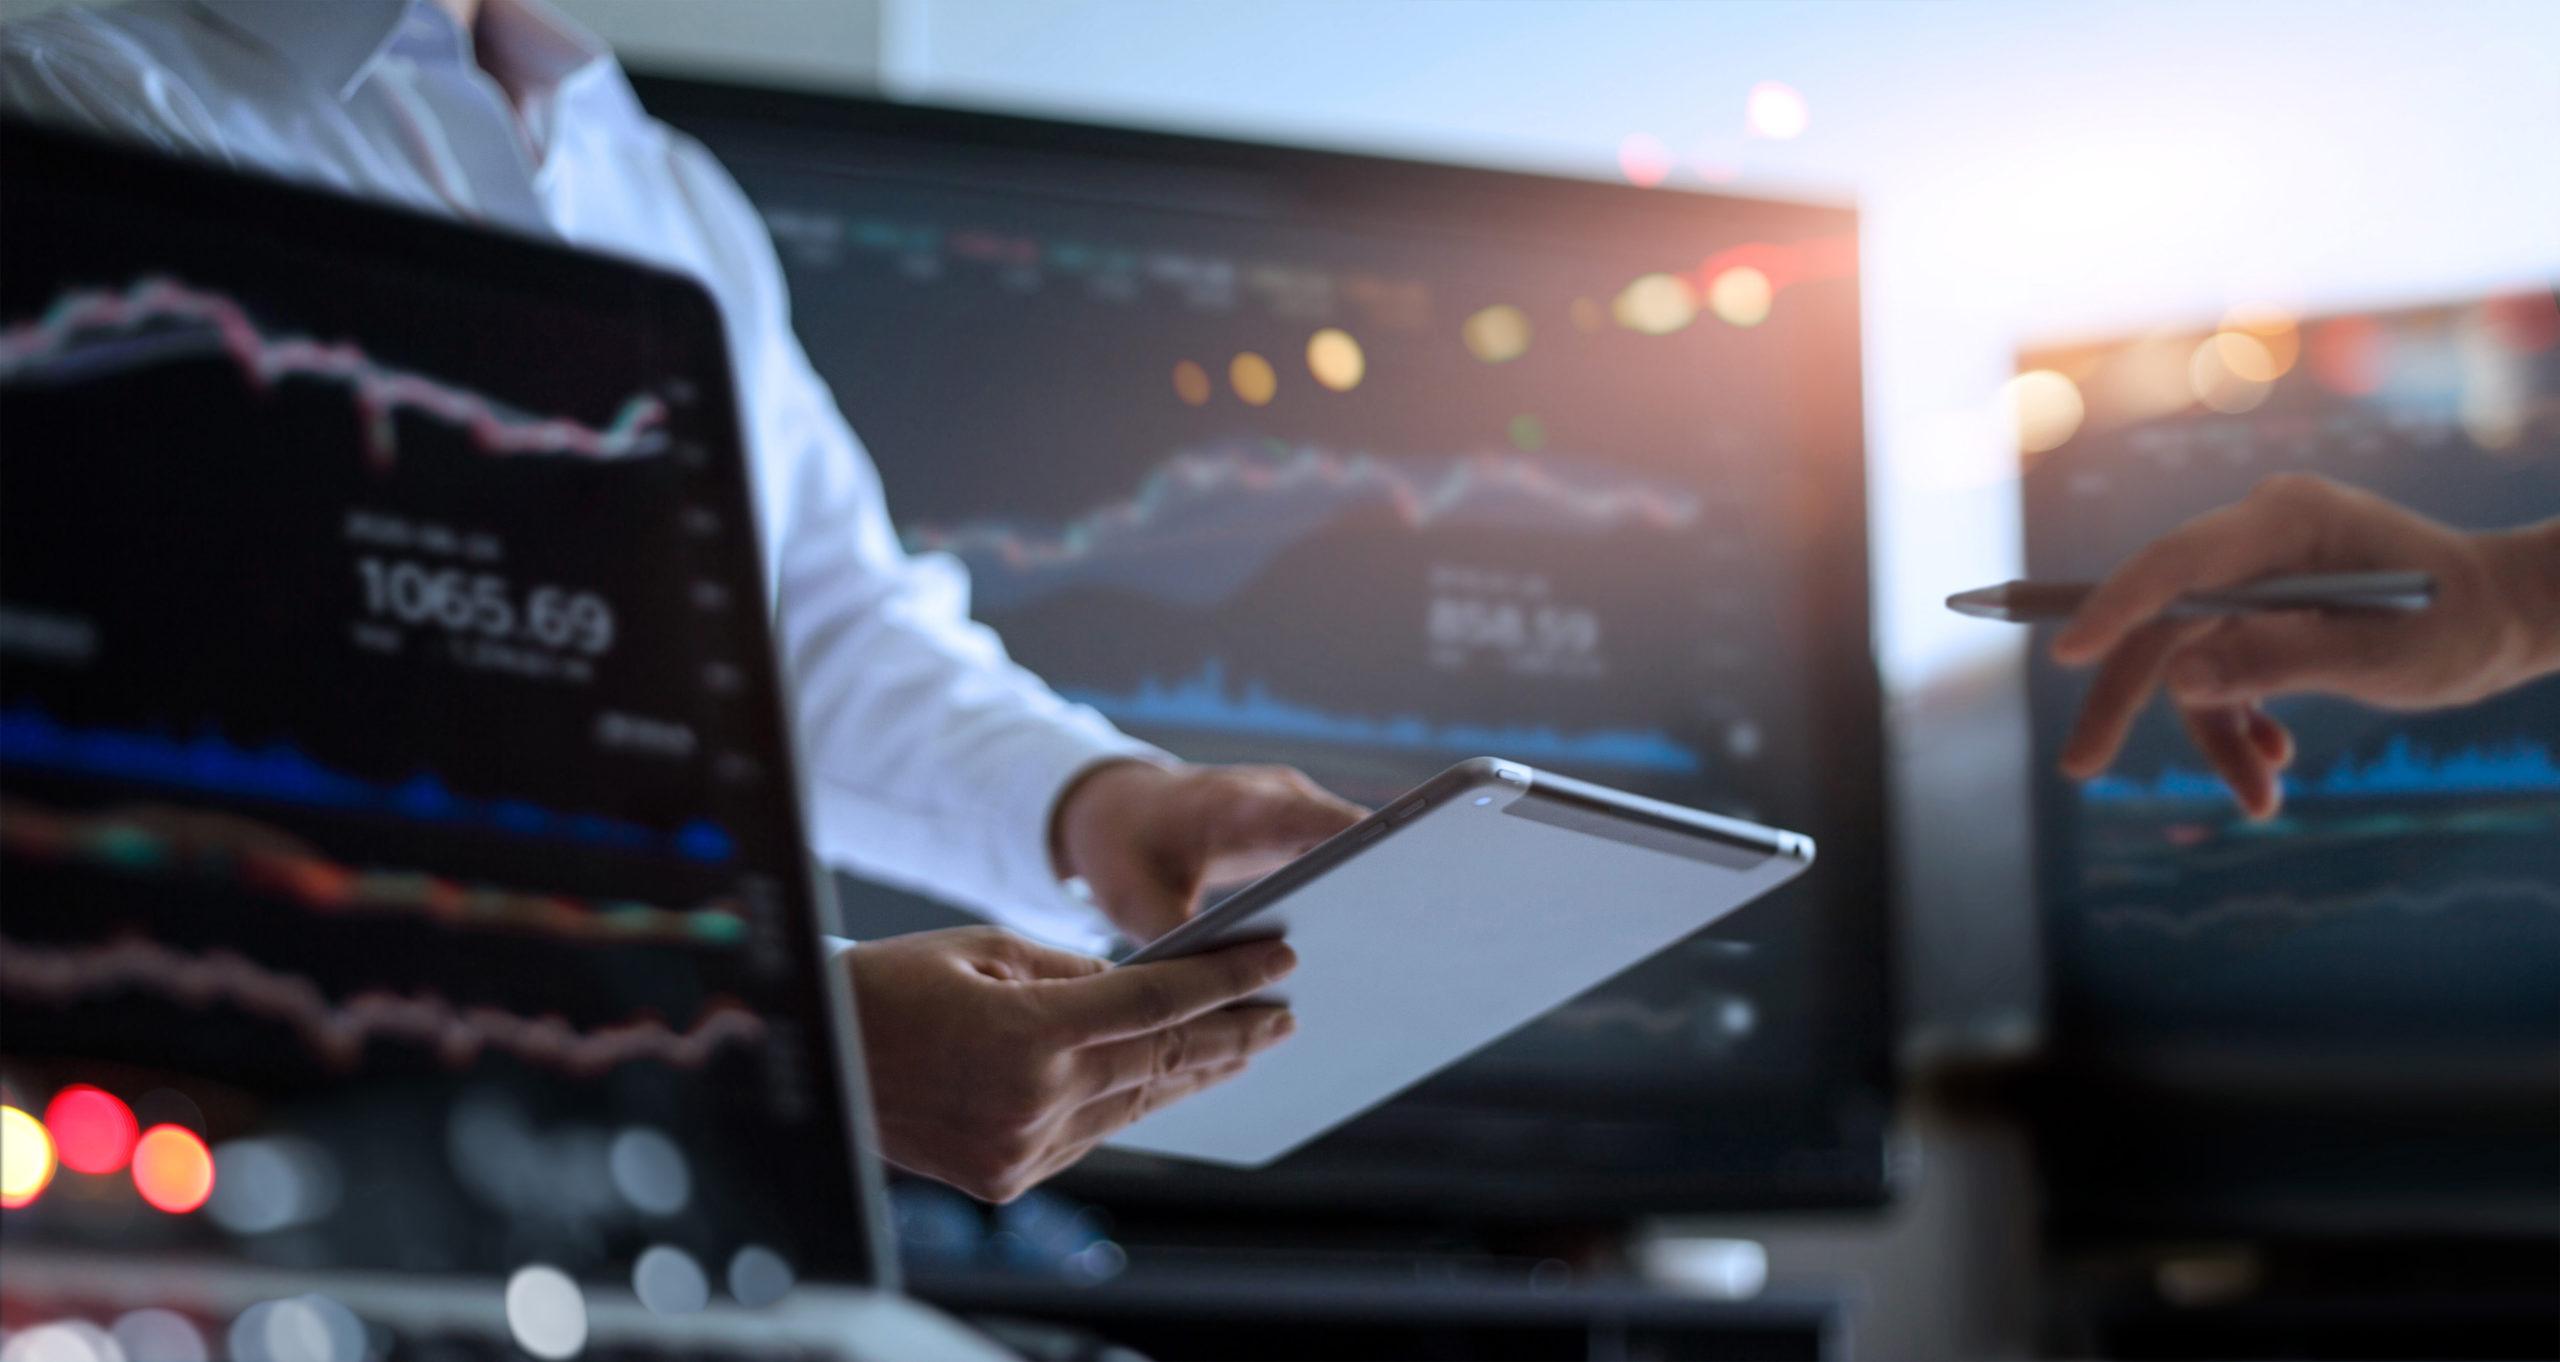 pantallas con gráficos finanzas